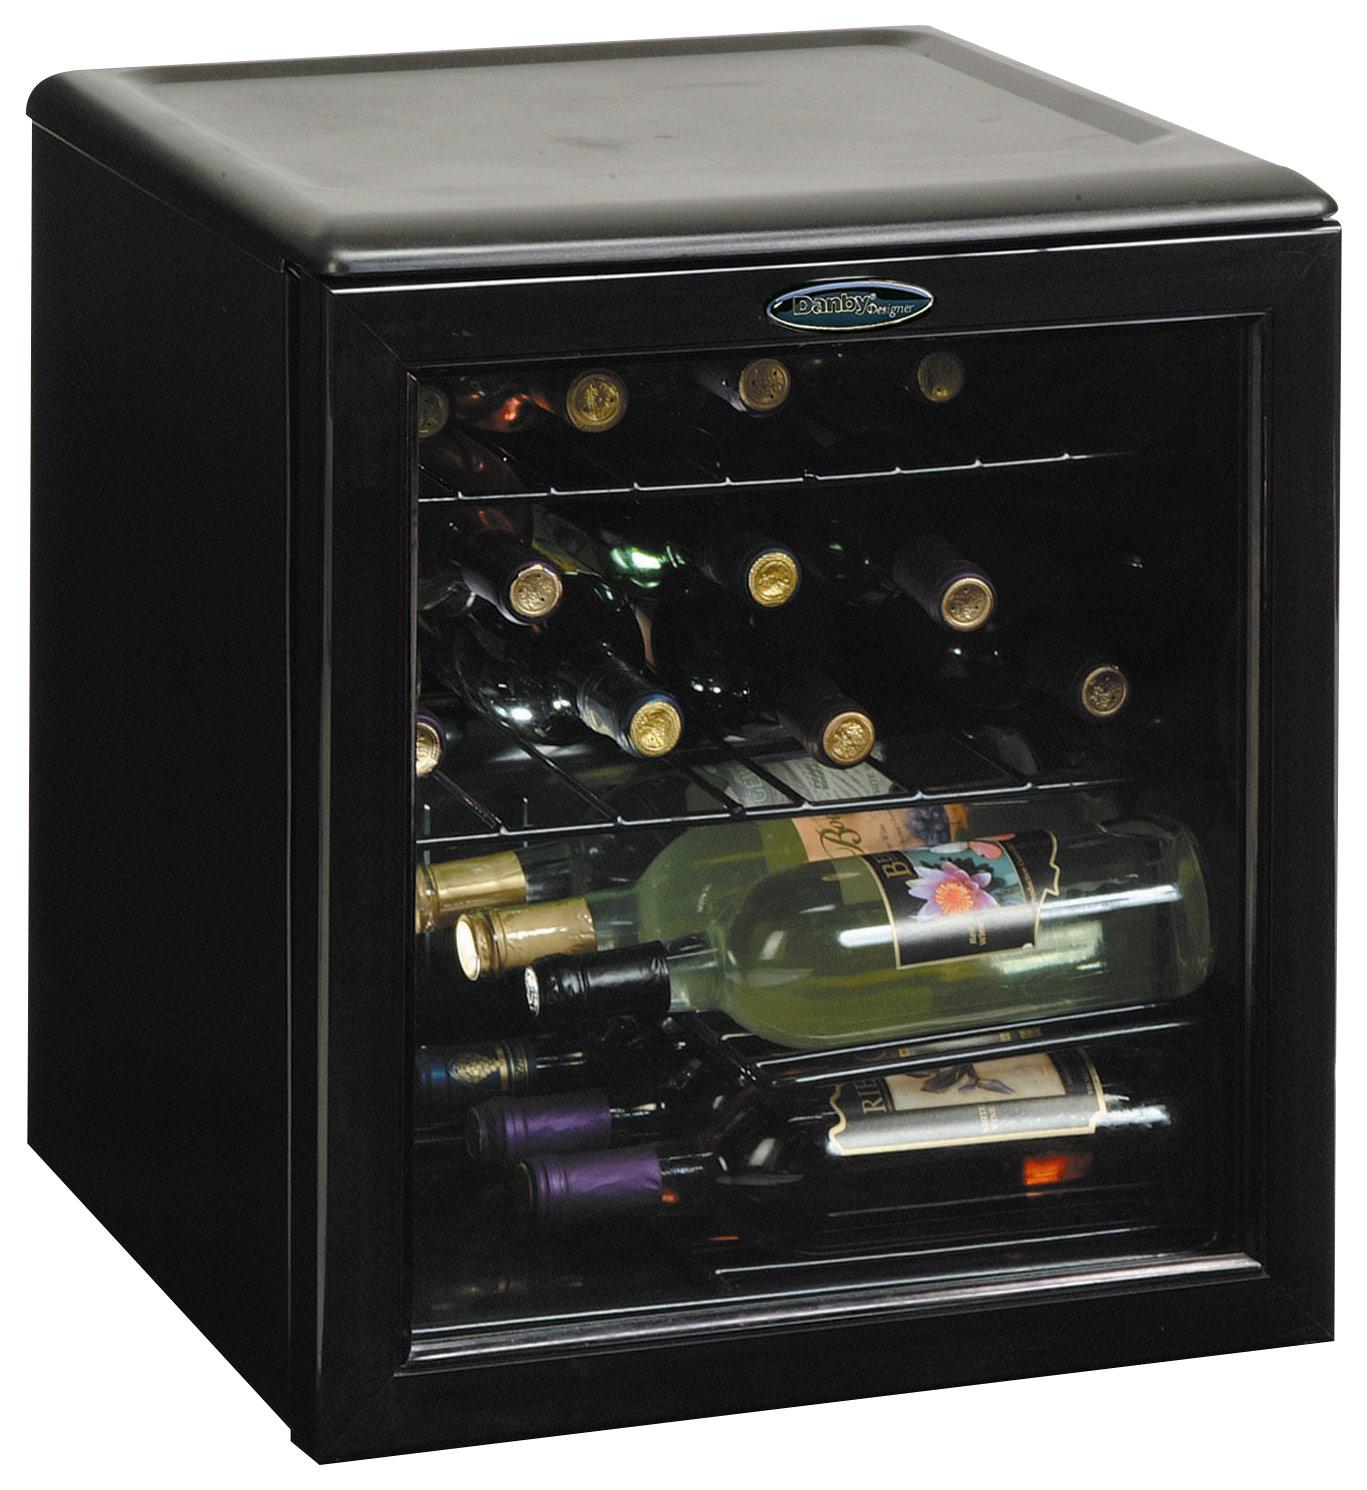 Click here for Danby - Designer 17-bottle Wine Cellar - Black prices